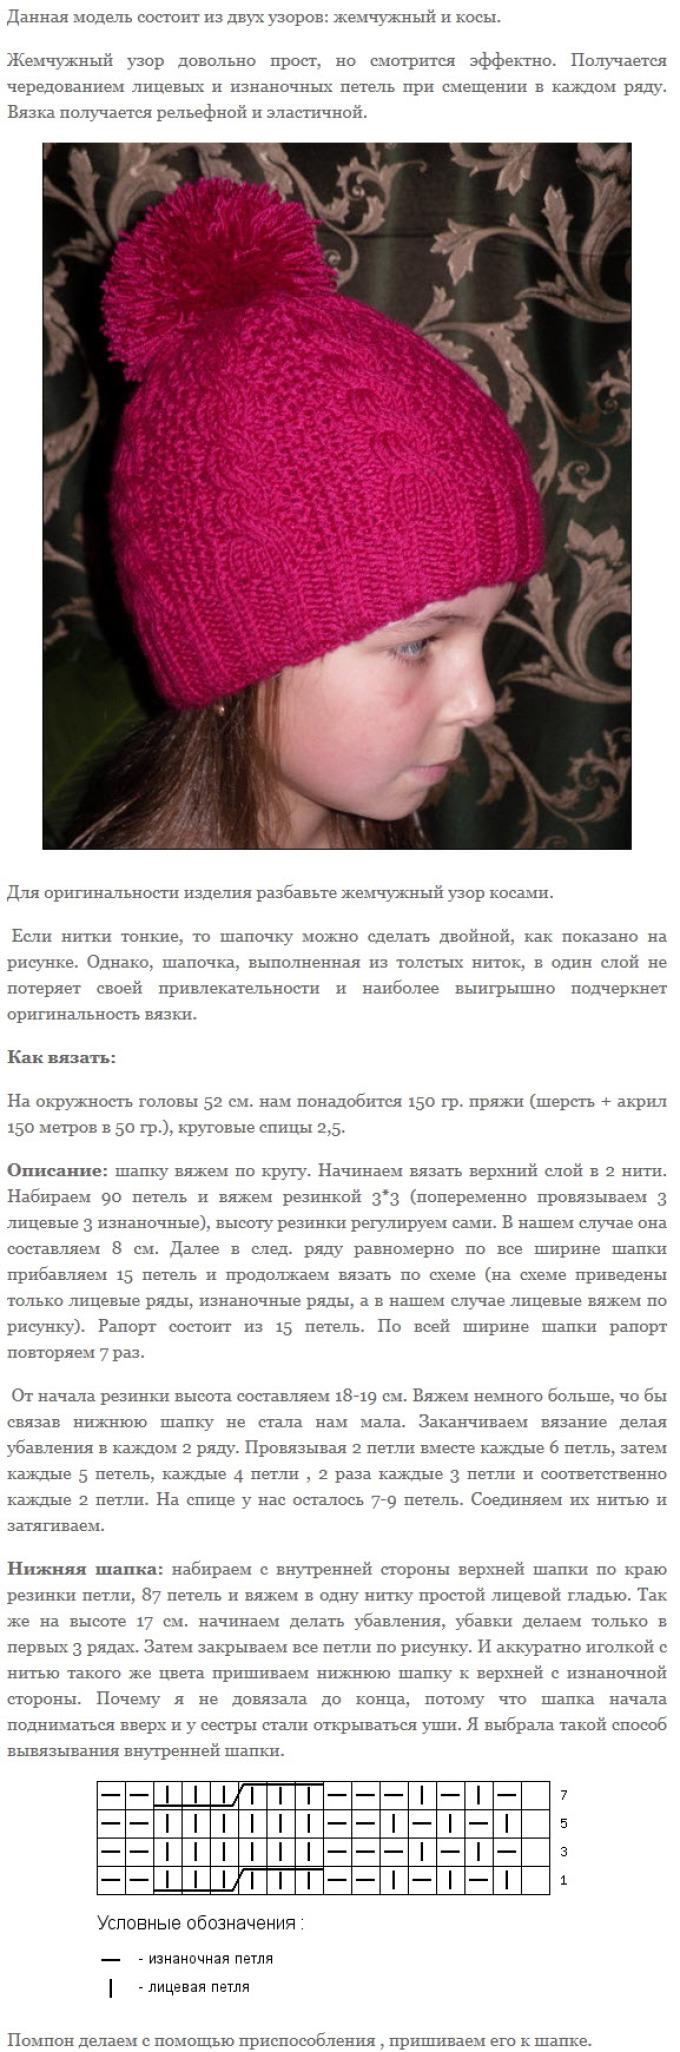 shapka dlya devochki spicami 2 - Вязаные шапки для девочек спицами со схемами и описанием